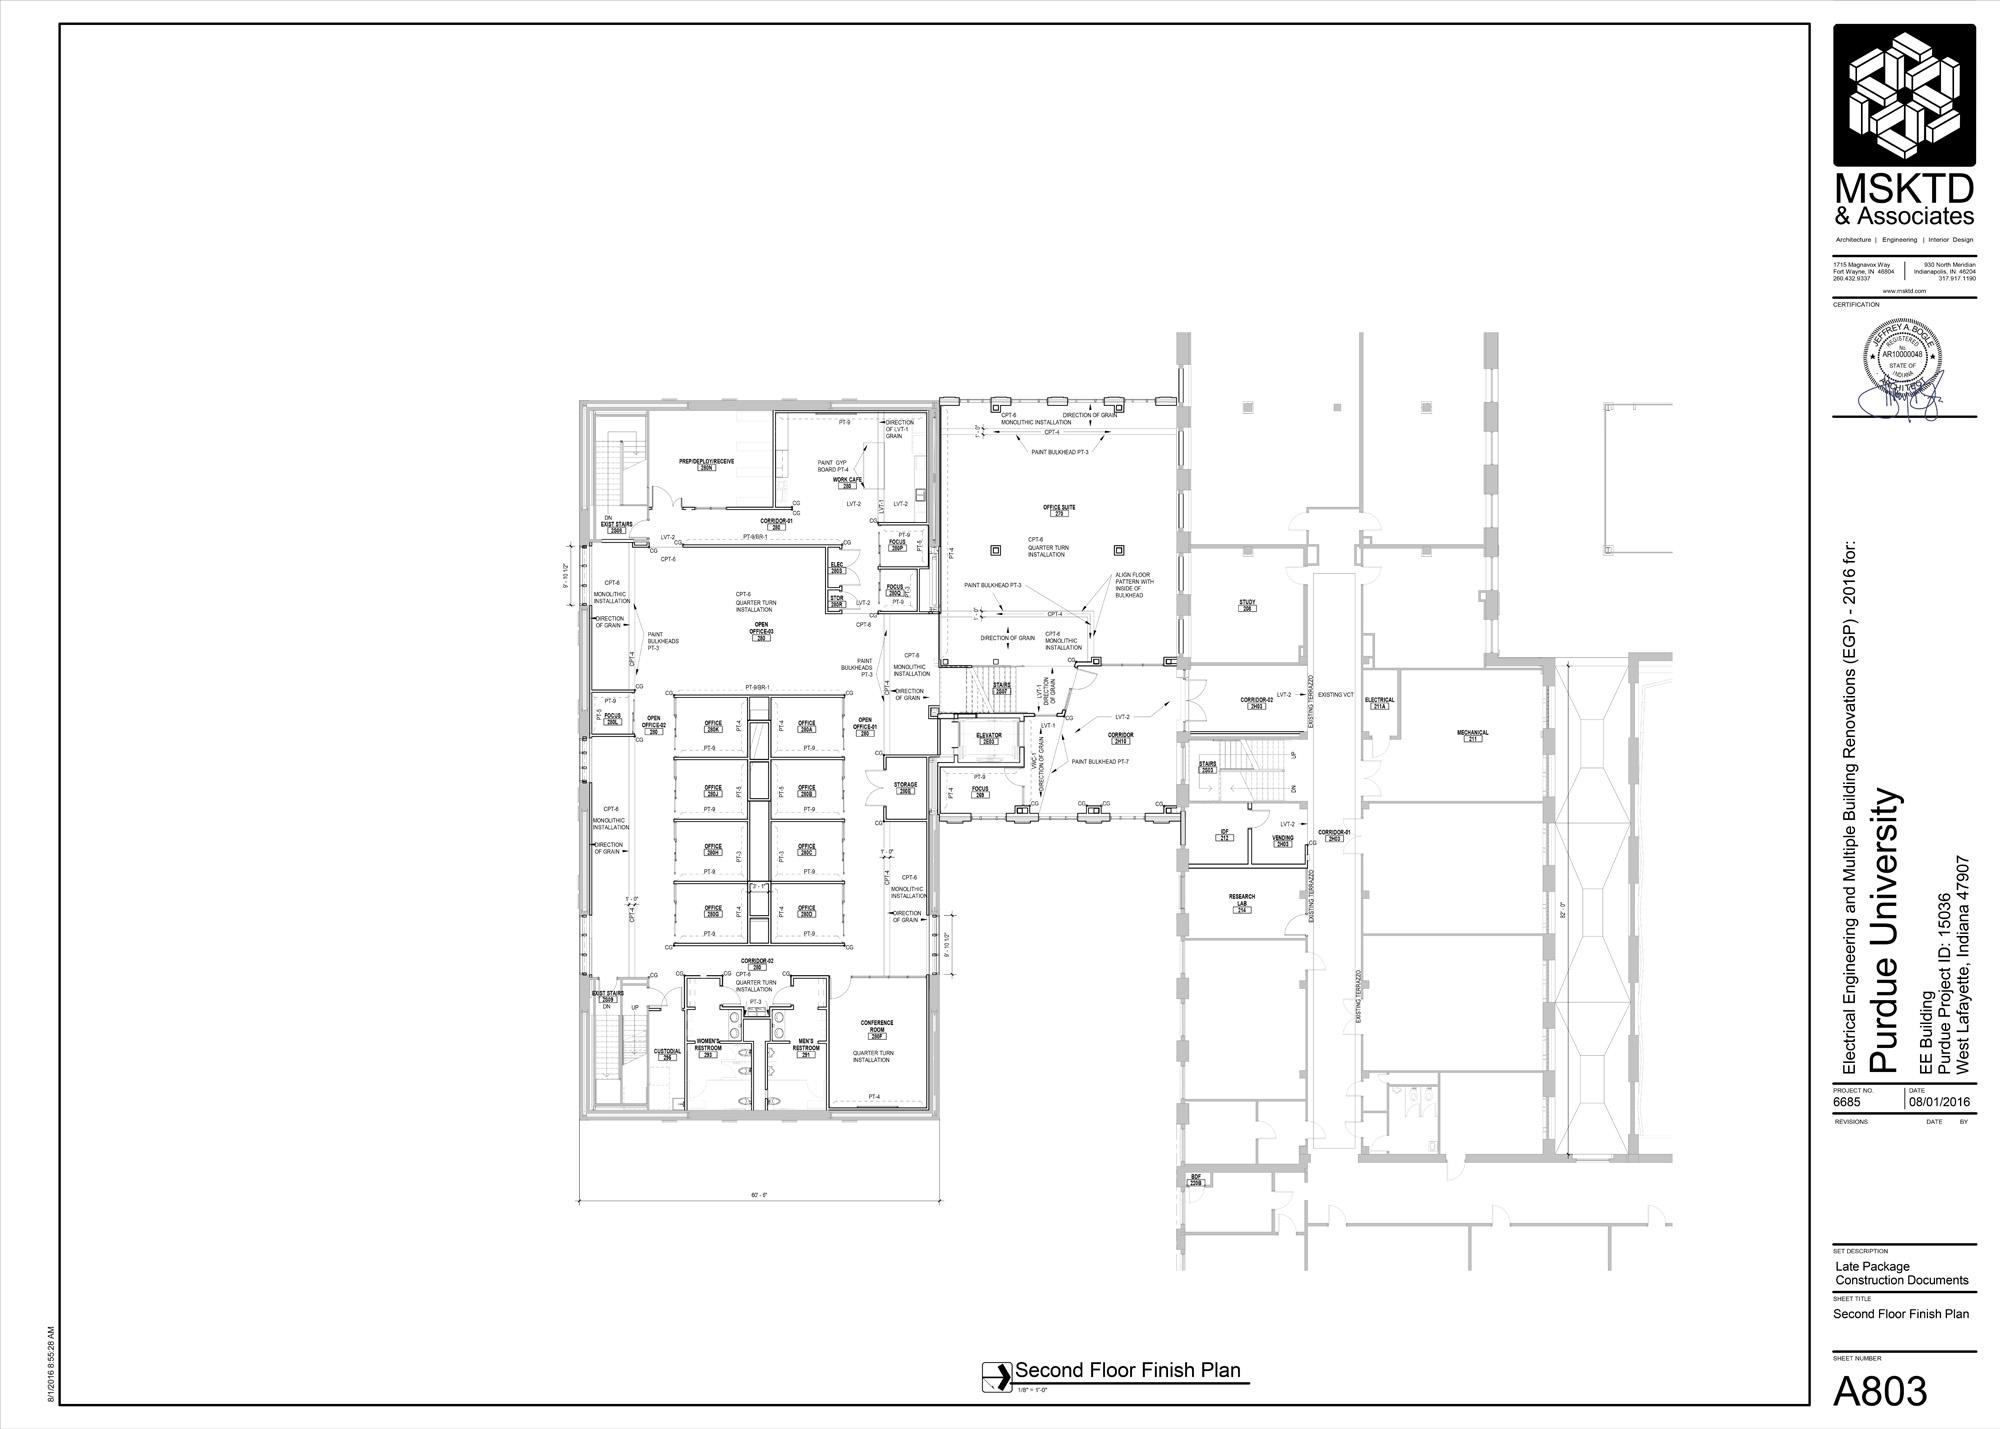 electrical engineer drawing at getdrawings com